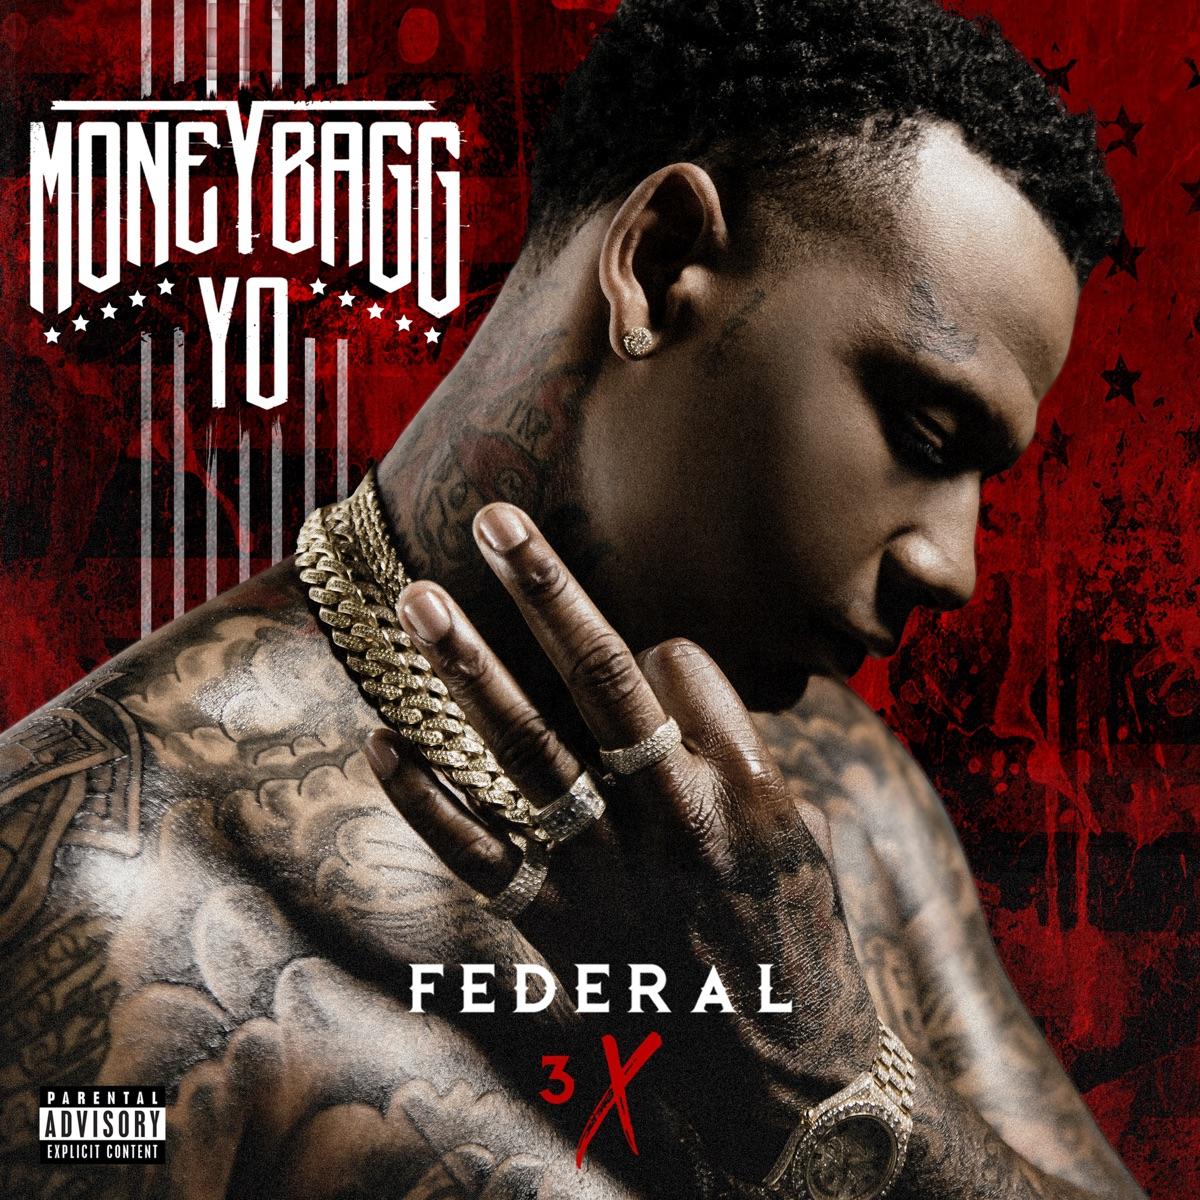 Federal 3X Moneybagg Yo CD cover